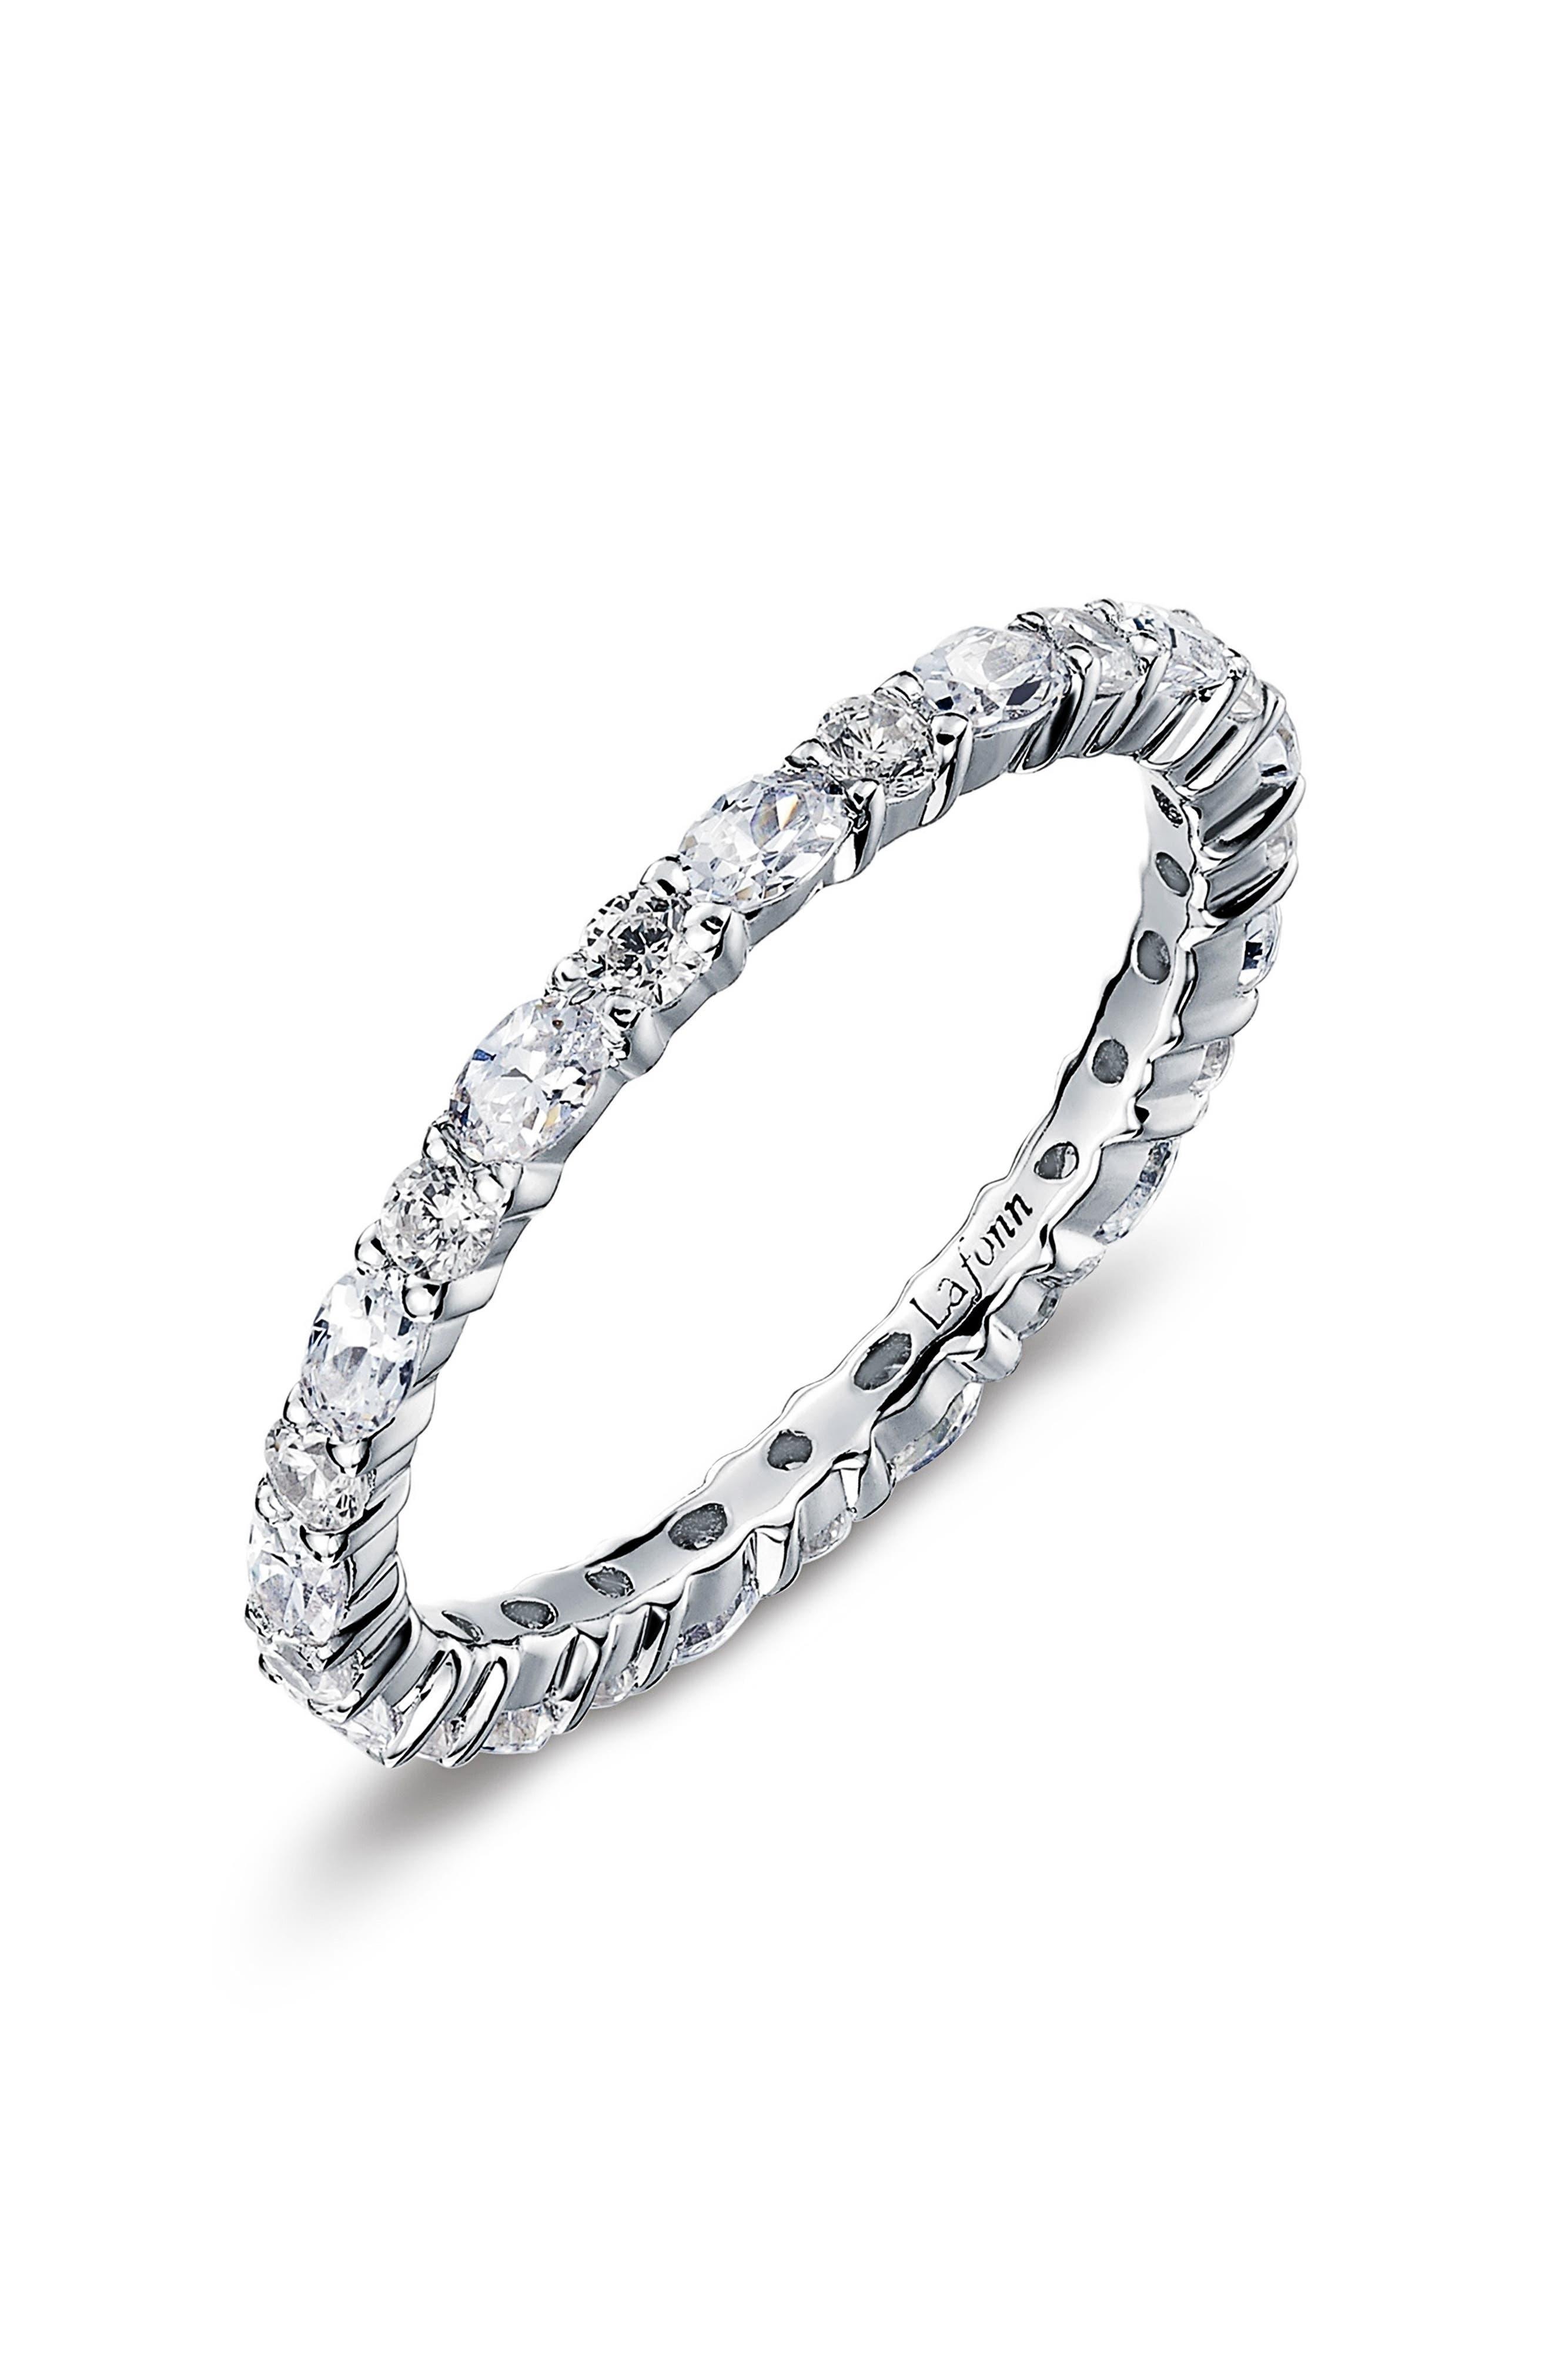 Simulated Diamond Birthstone Band Ring, Main, color, APRIL / CRYSTAL